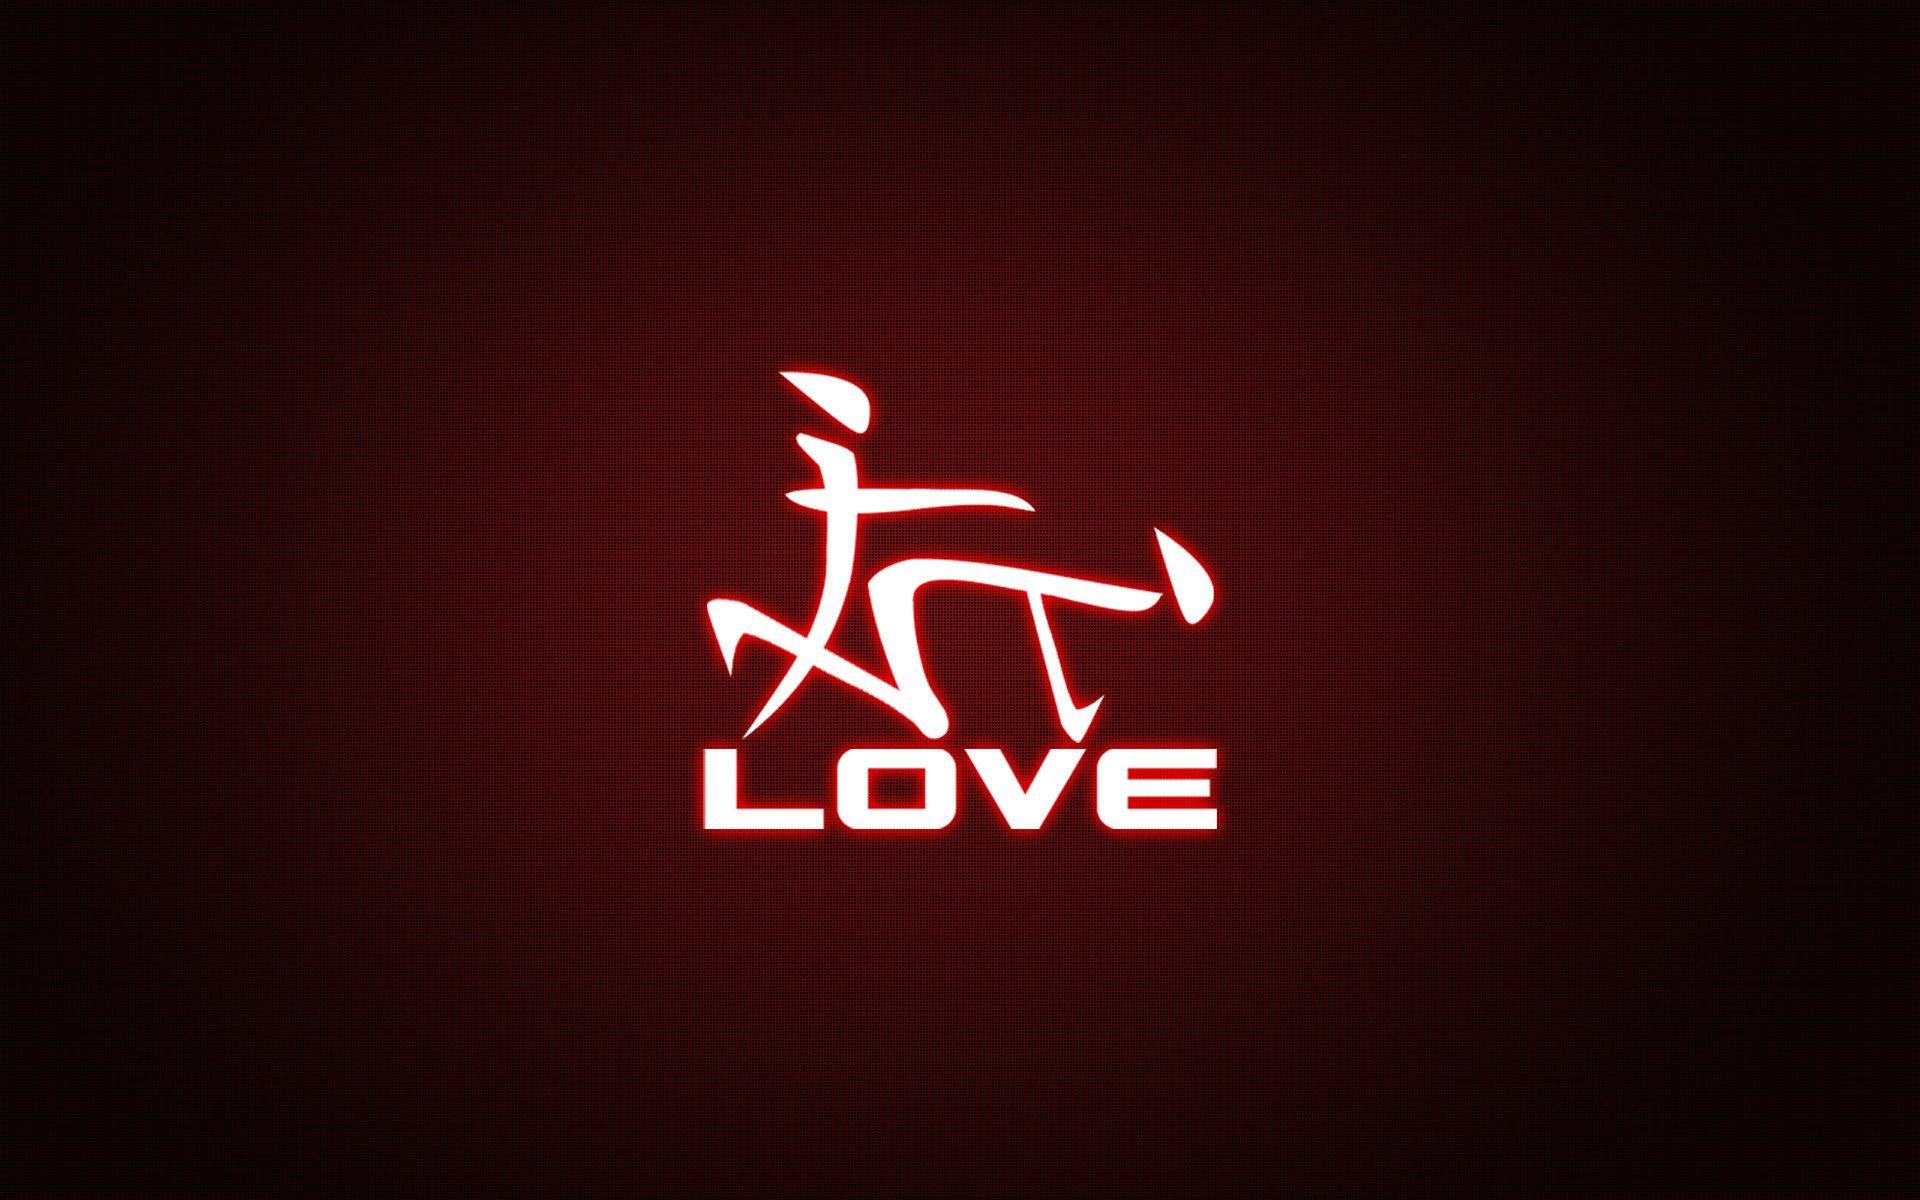 Artistic - Calligraphy  Love Romantic Wallpaper